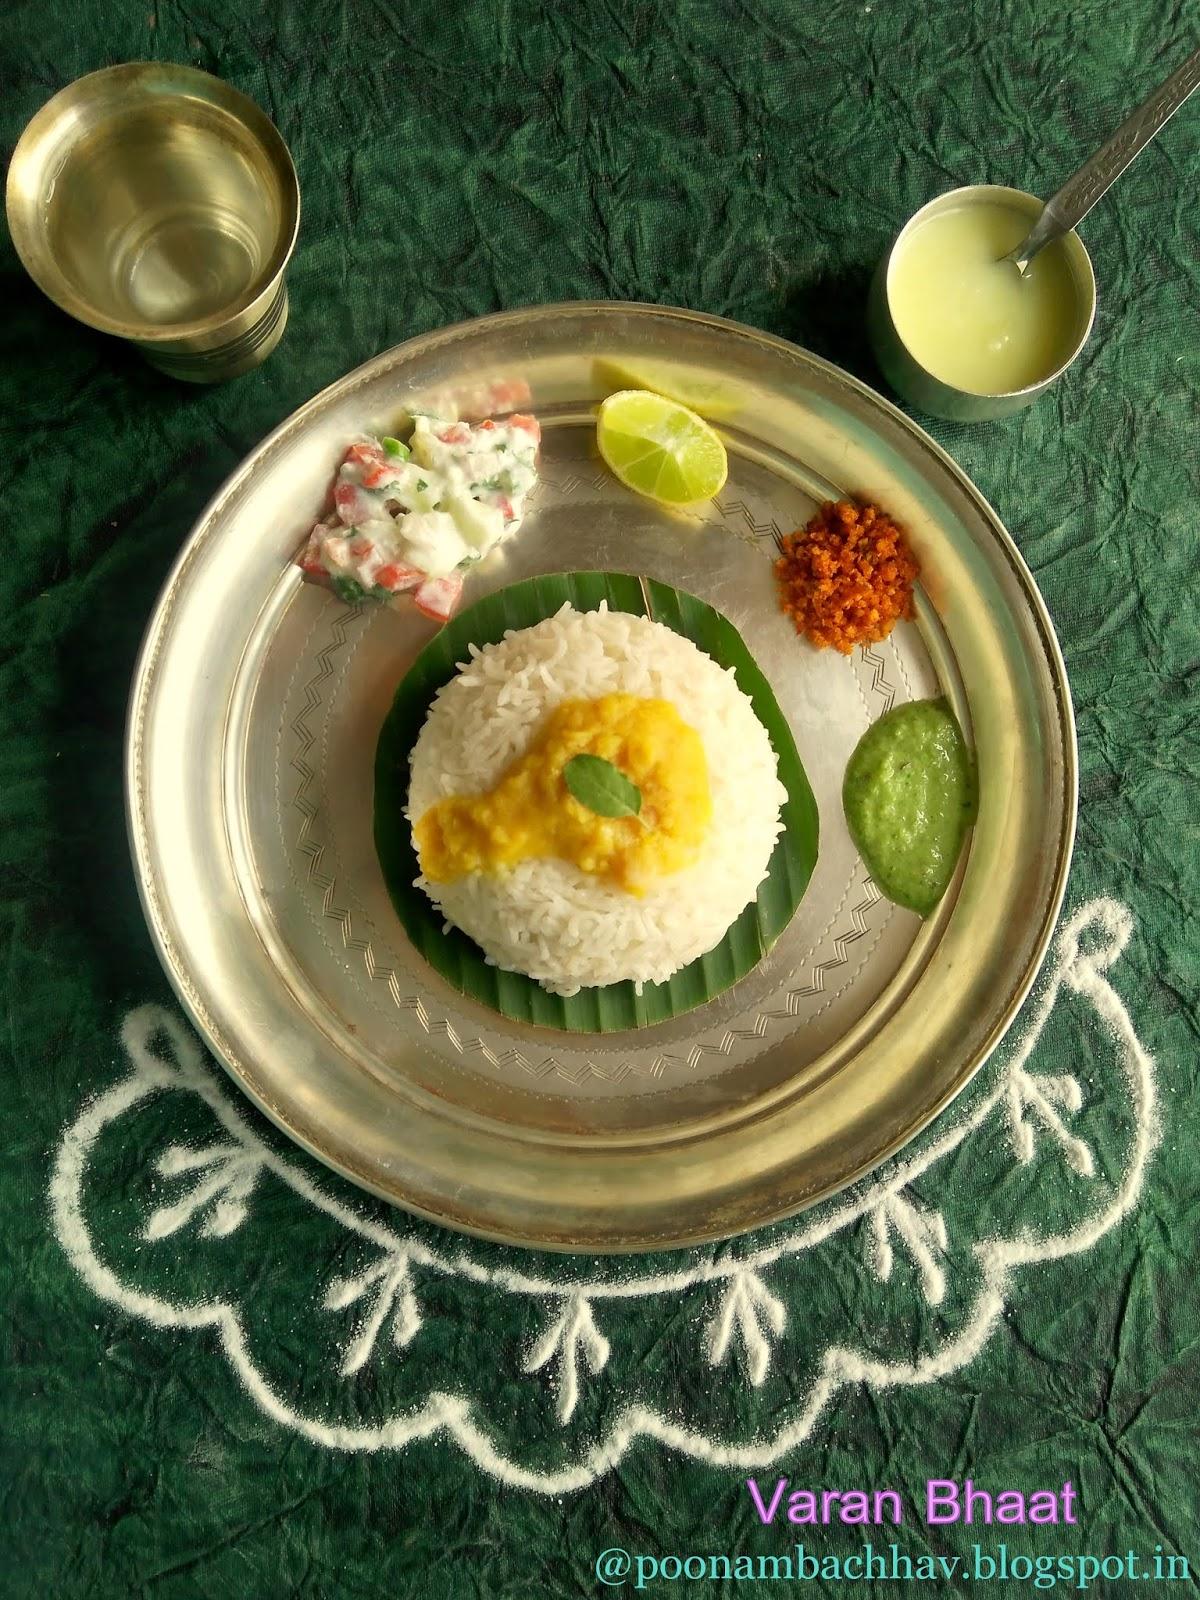 Annapurna: Maharashtrian Varan Bhaat Recipe